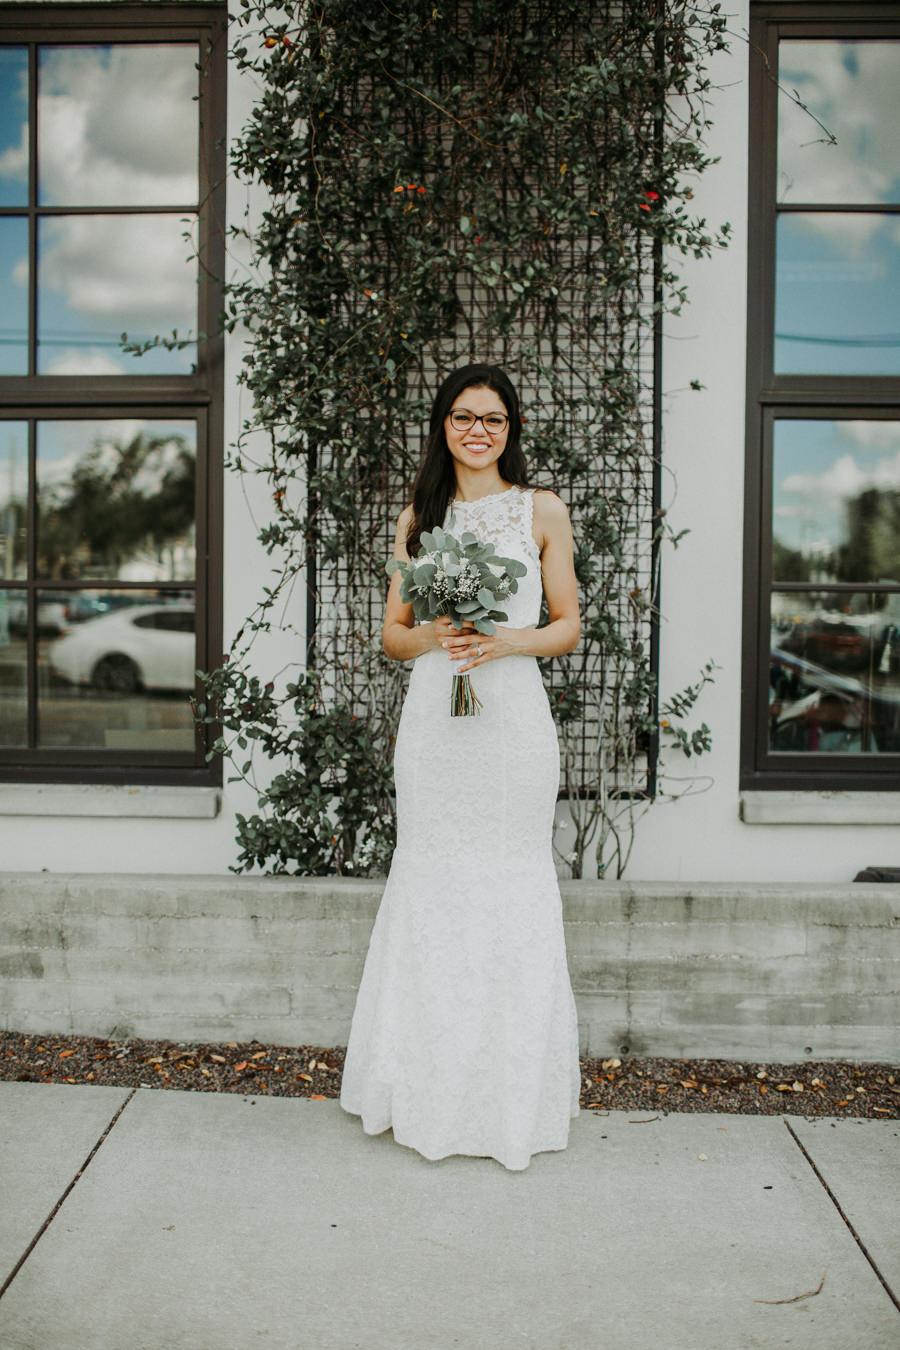 Tampa Heights Industrial Wedding at Cavu Emmy RJ-116.jpg